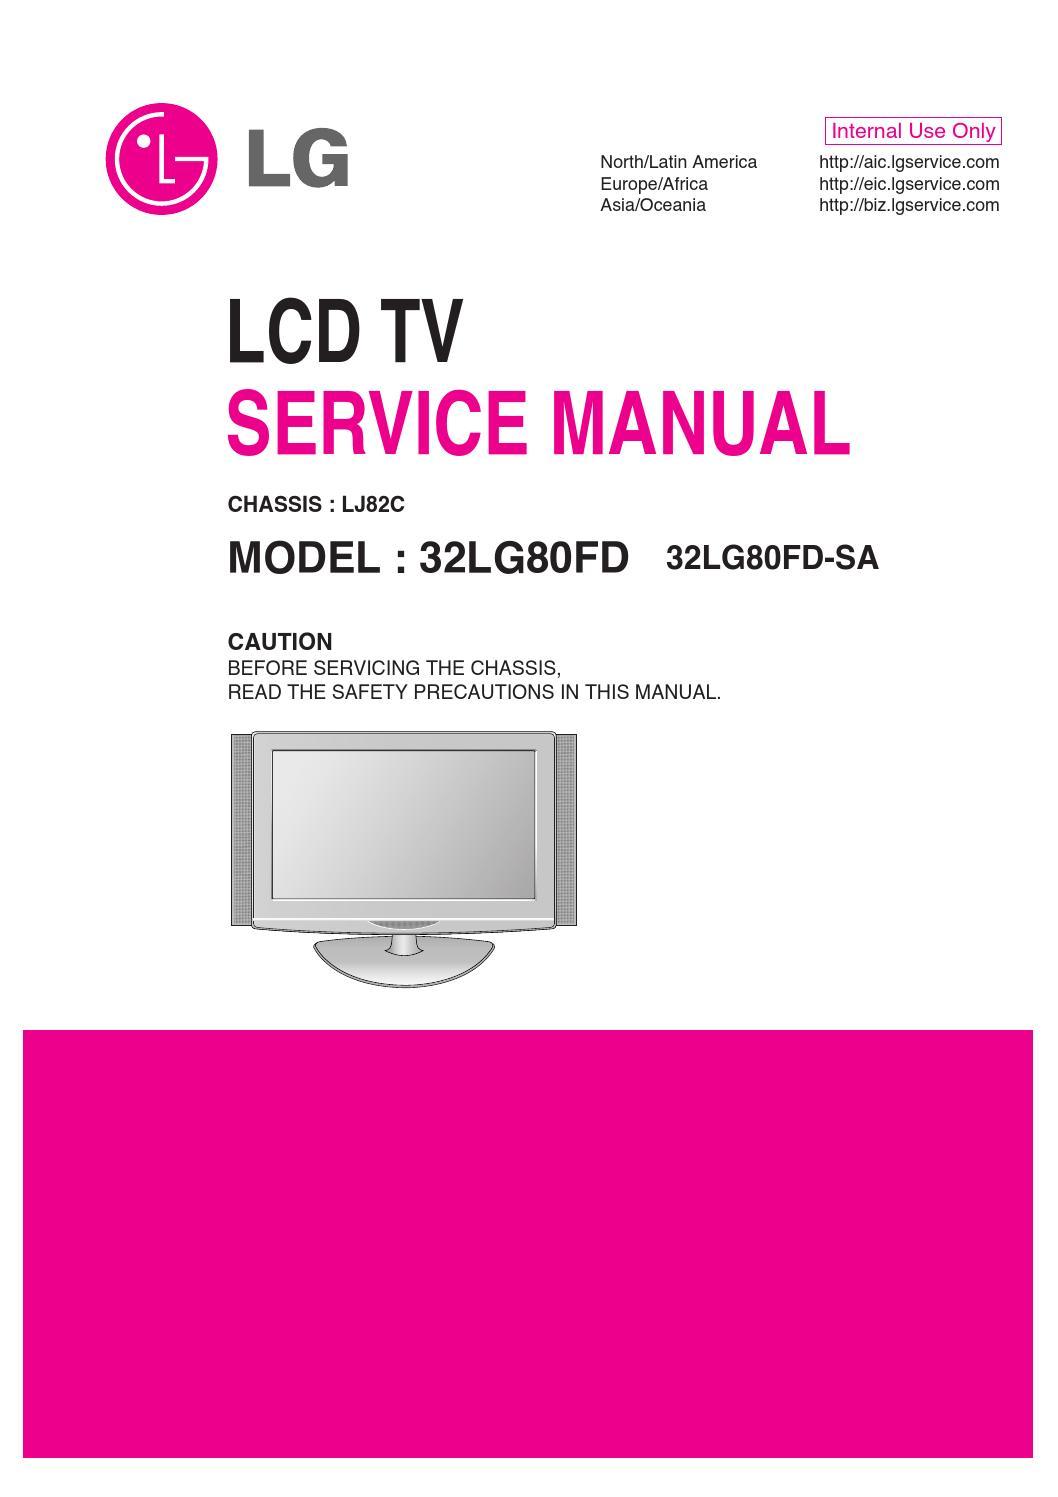 Manual    de servi  o televisor lg 32lg80fd sa chassis lj82c